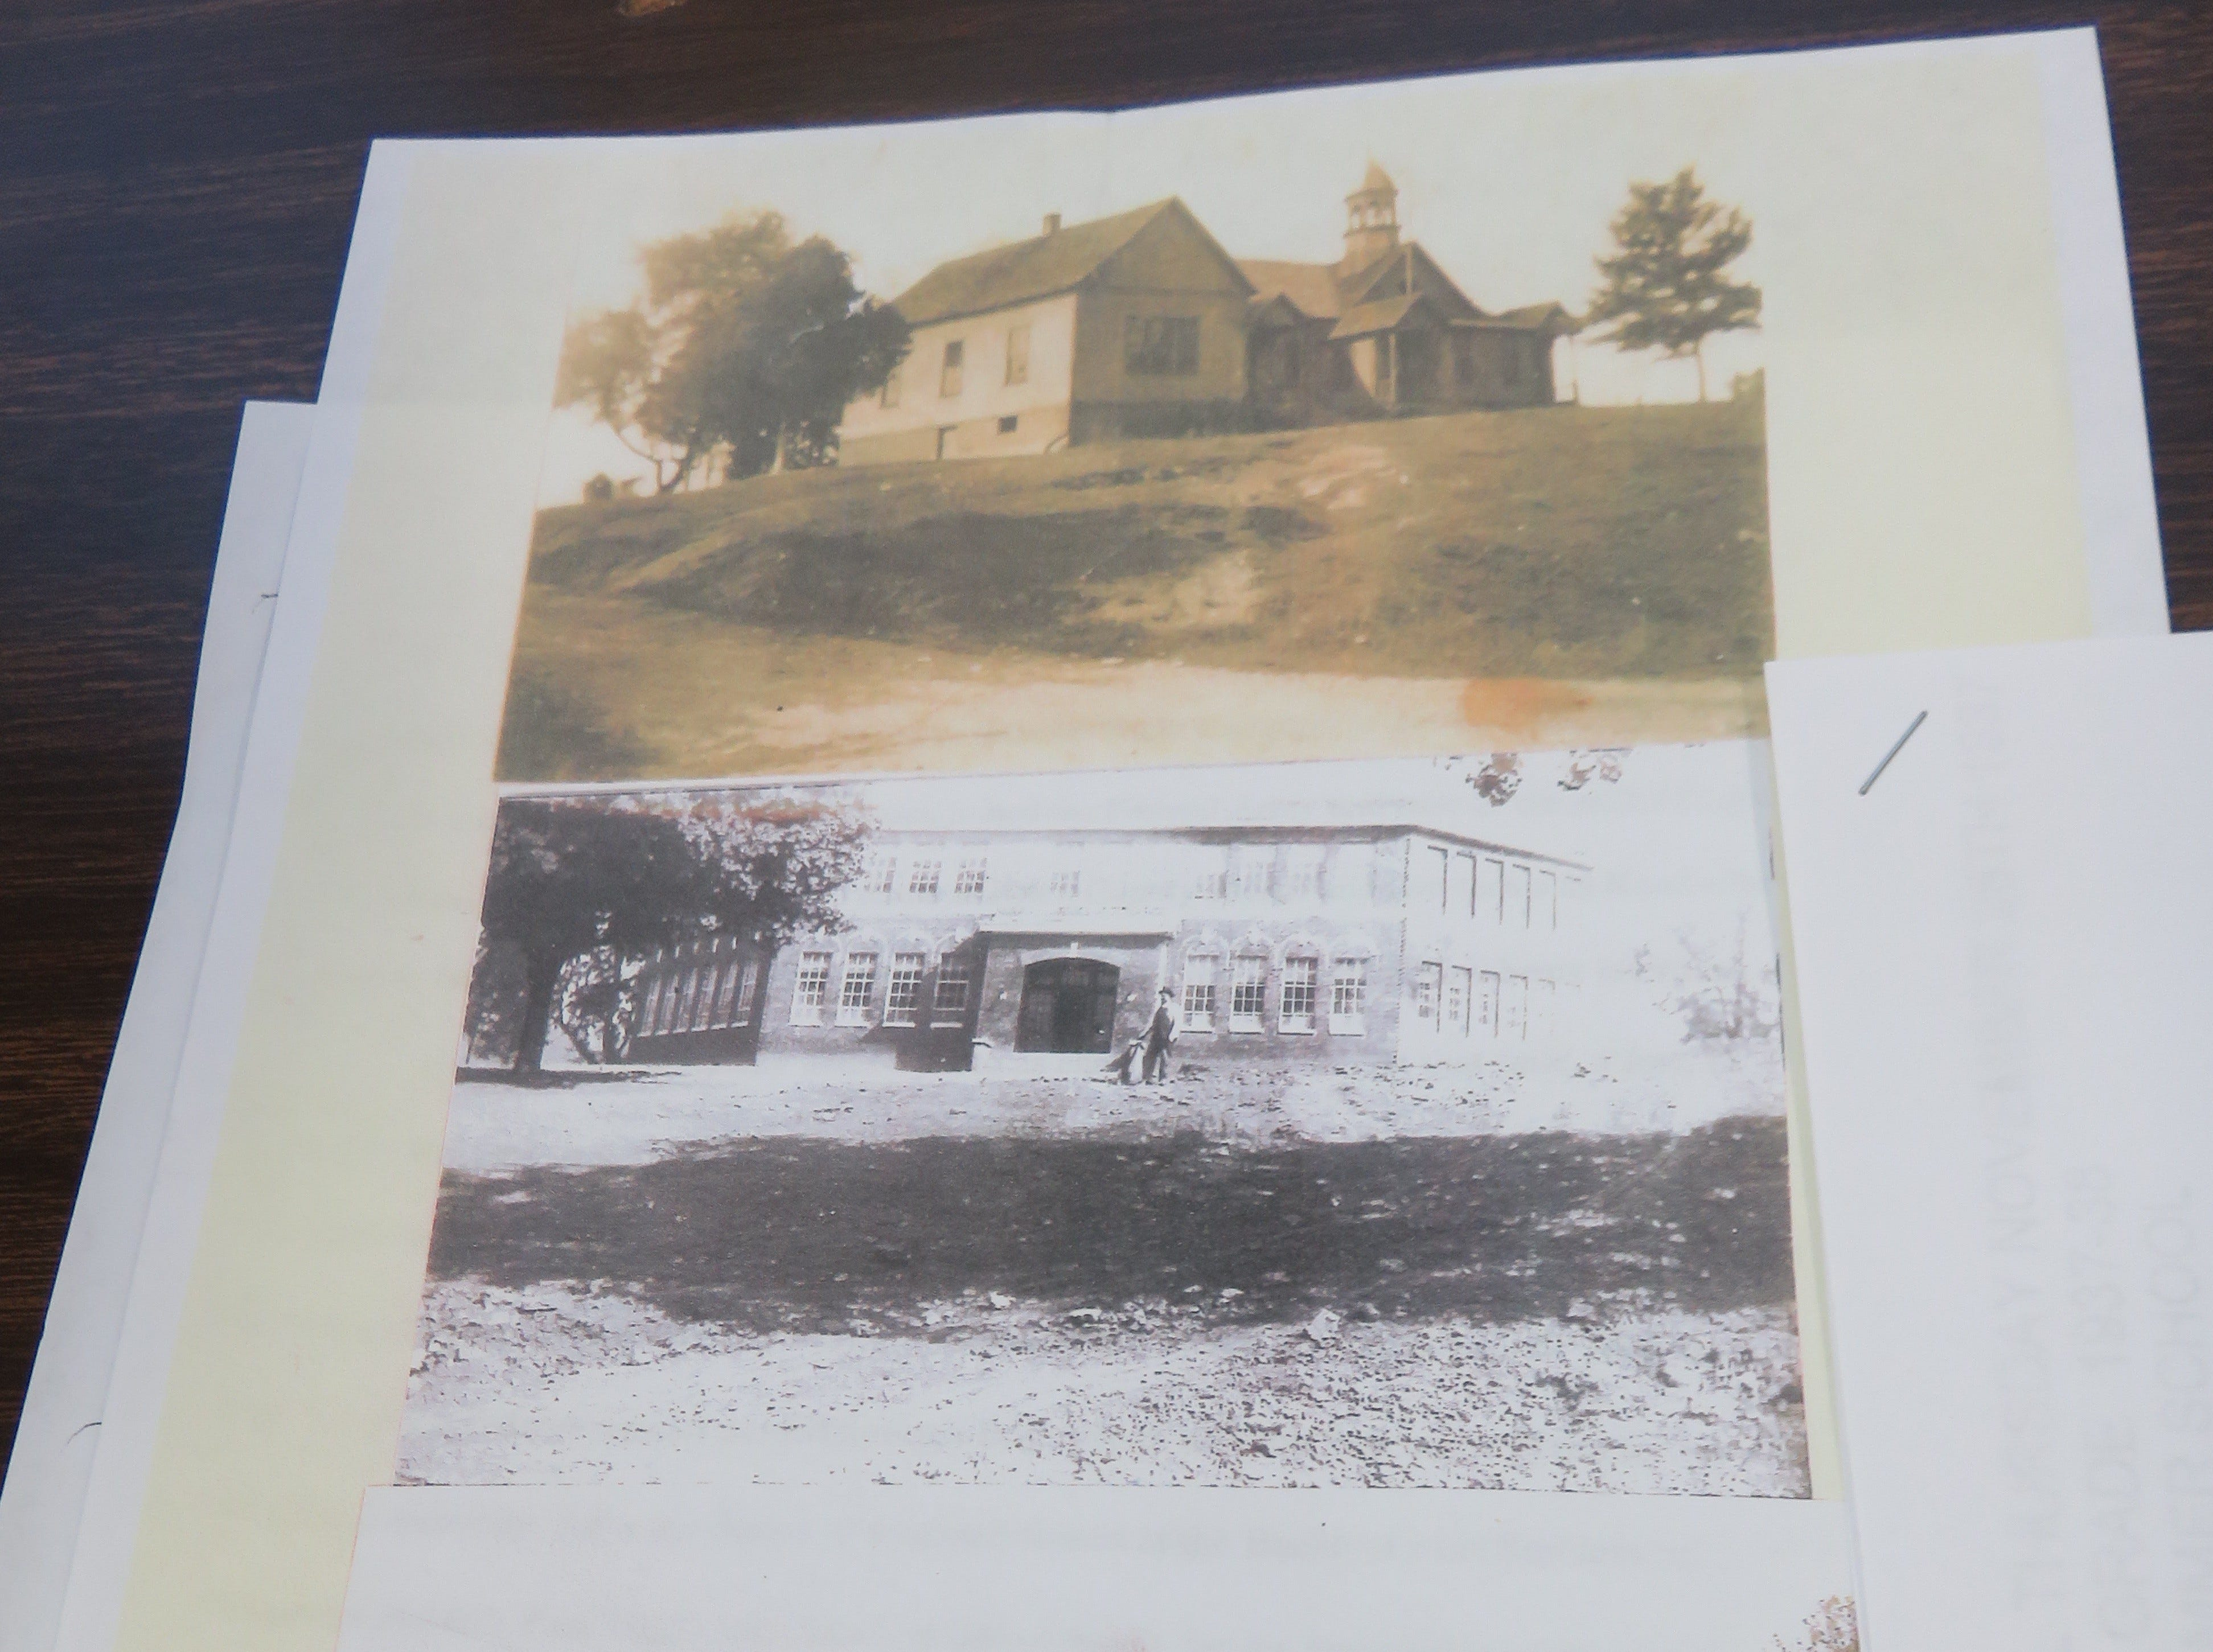 Old photos show three different Bearden Elementary Schools.